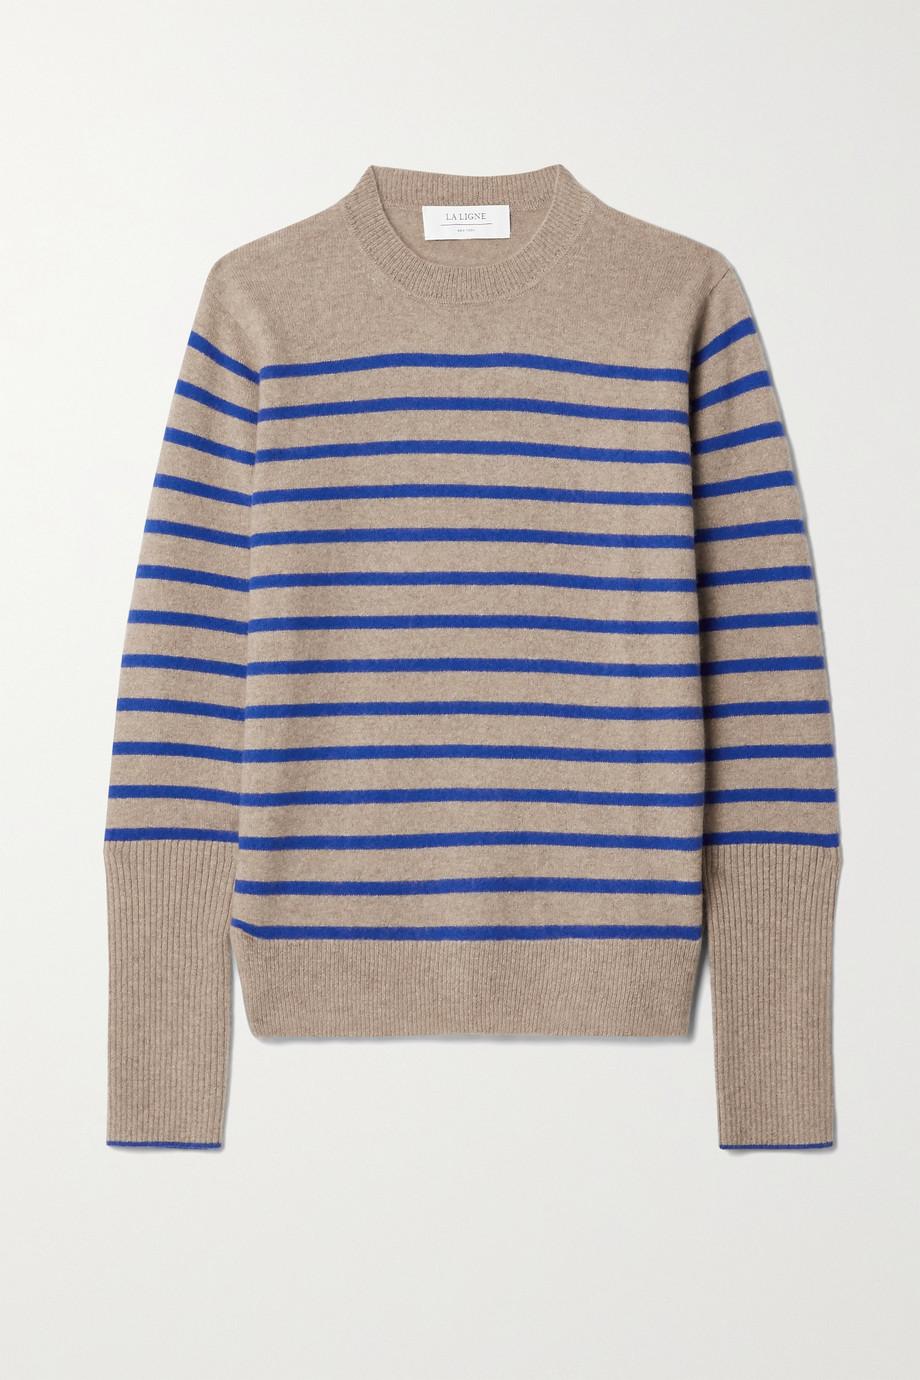 La Ligne AAA Lean Lines striped cashmere sweater